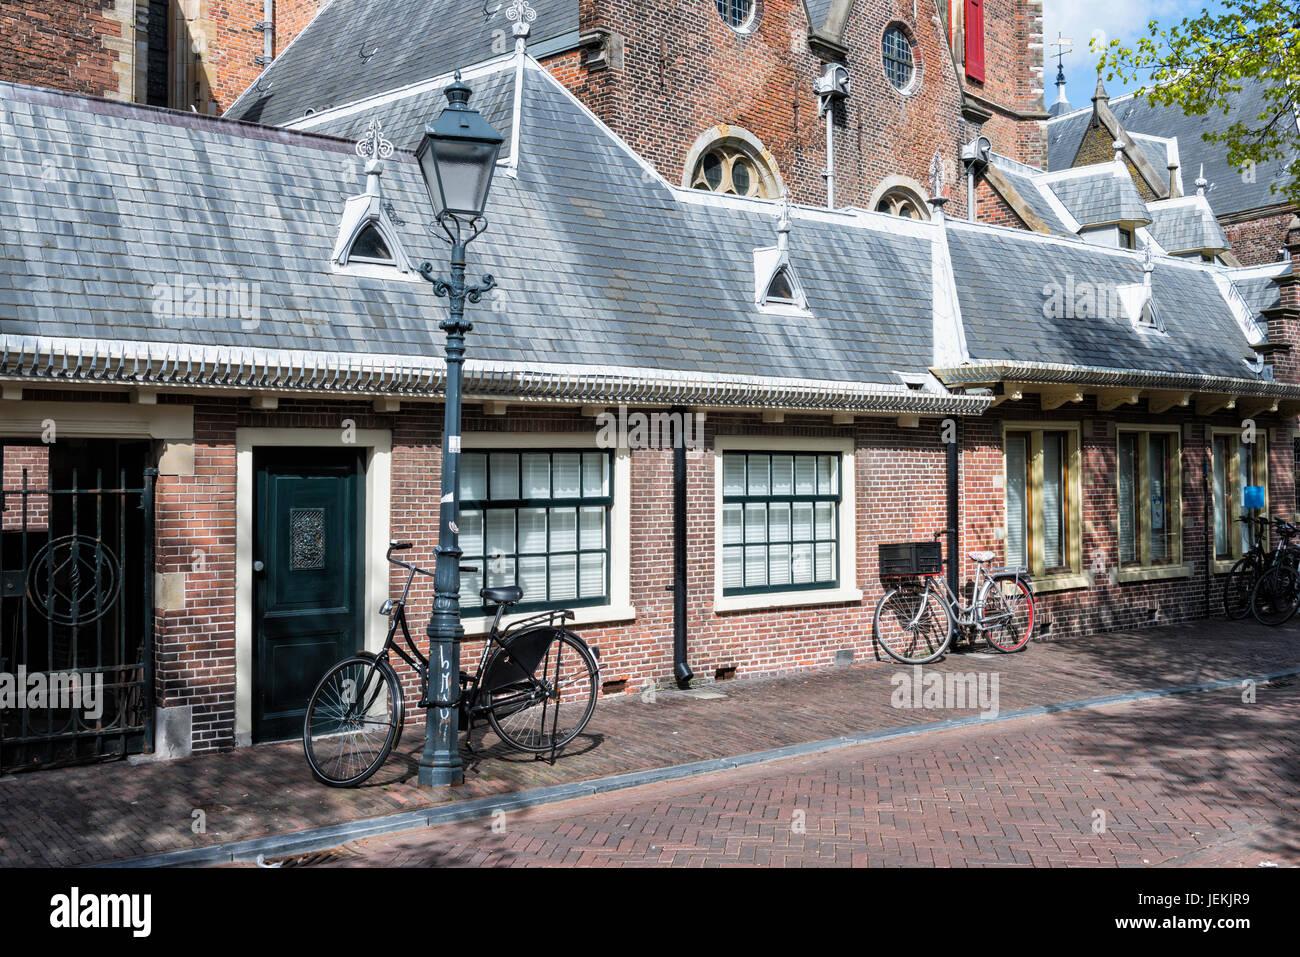 Late Gothic Grote Kerk or St.-Bavokerk Protestant church, Haarlem, North Holland, The Netherlands - Stock Image